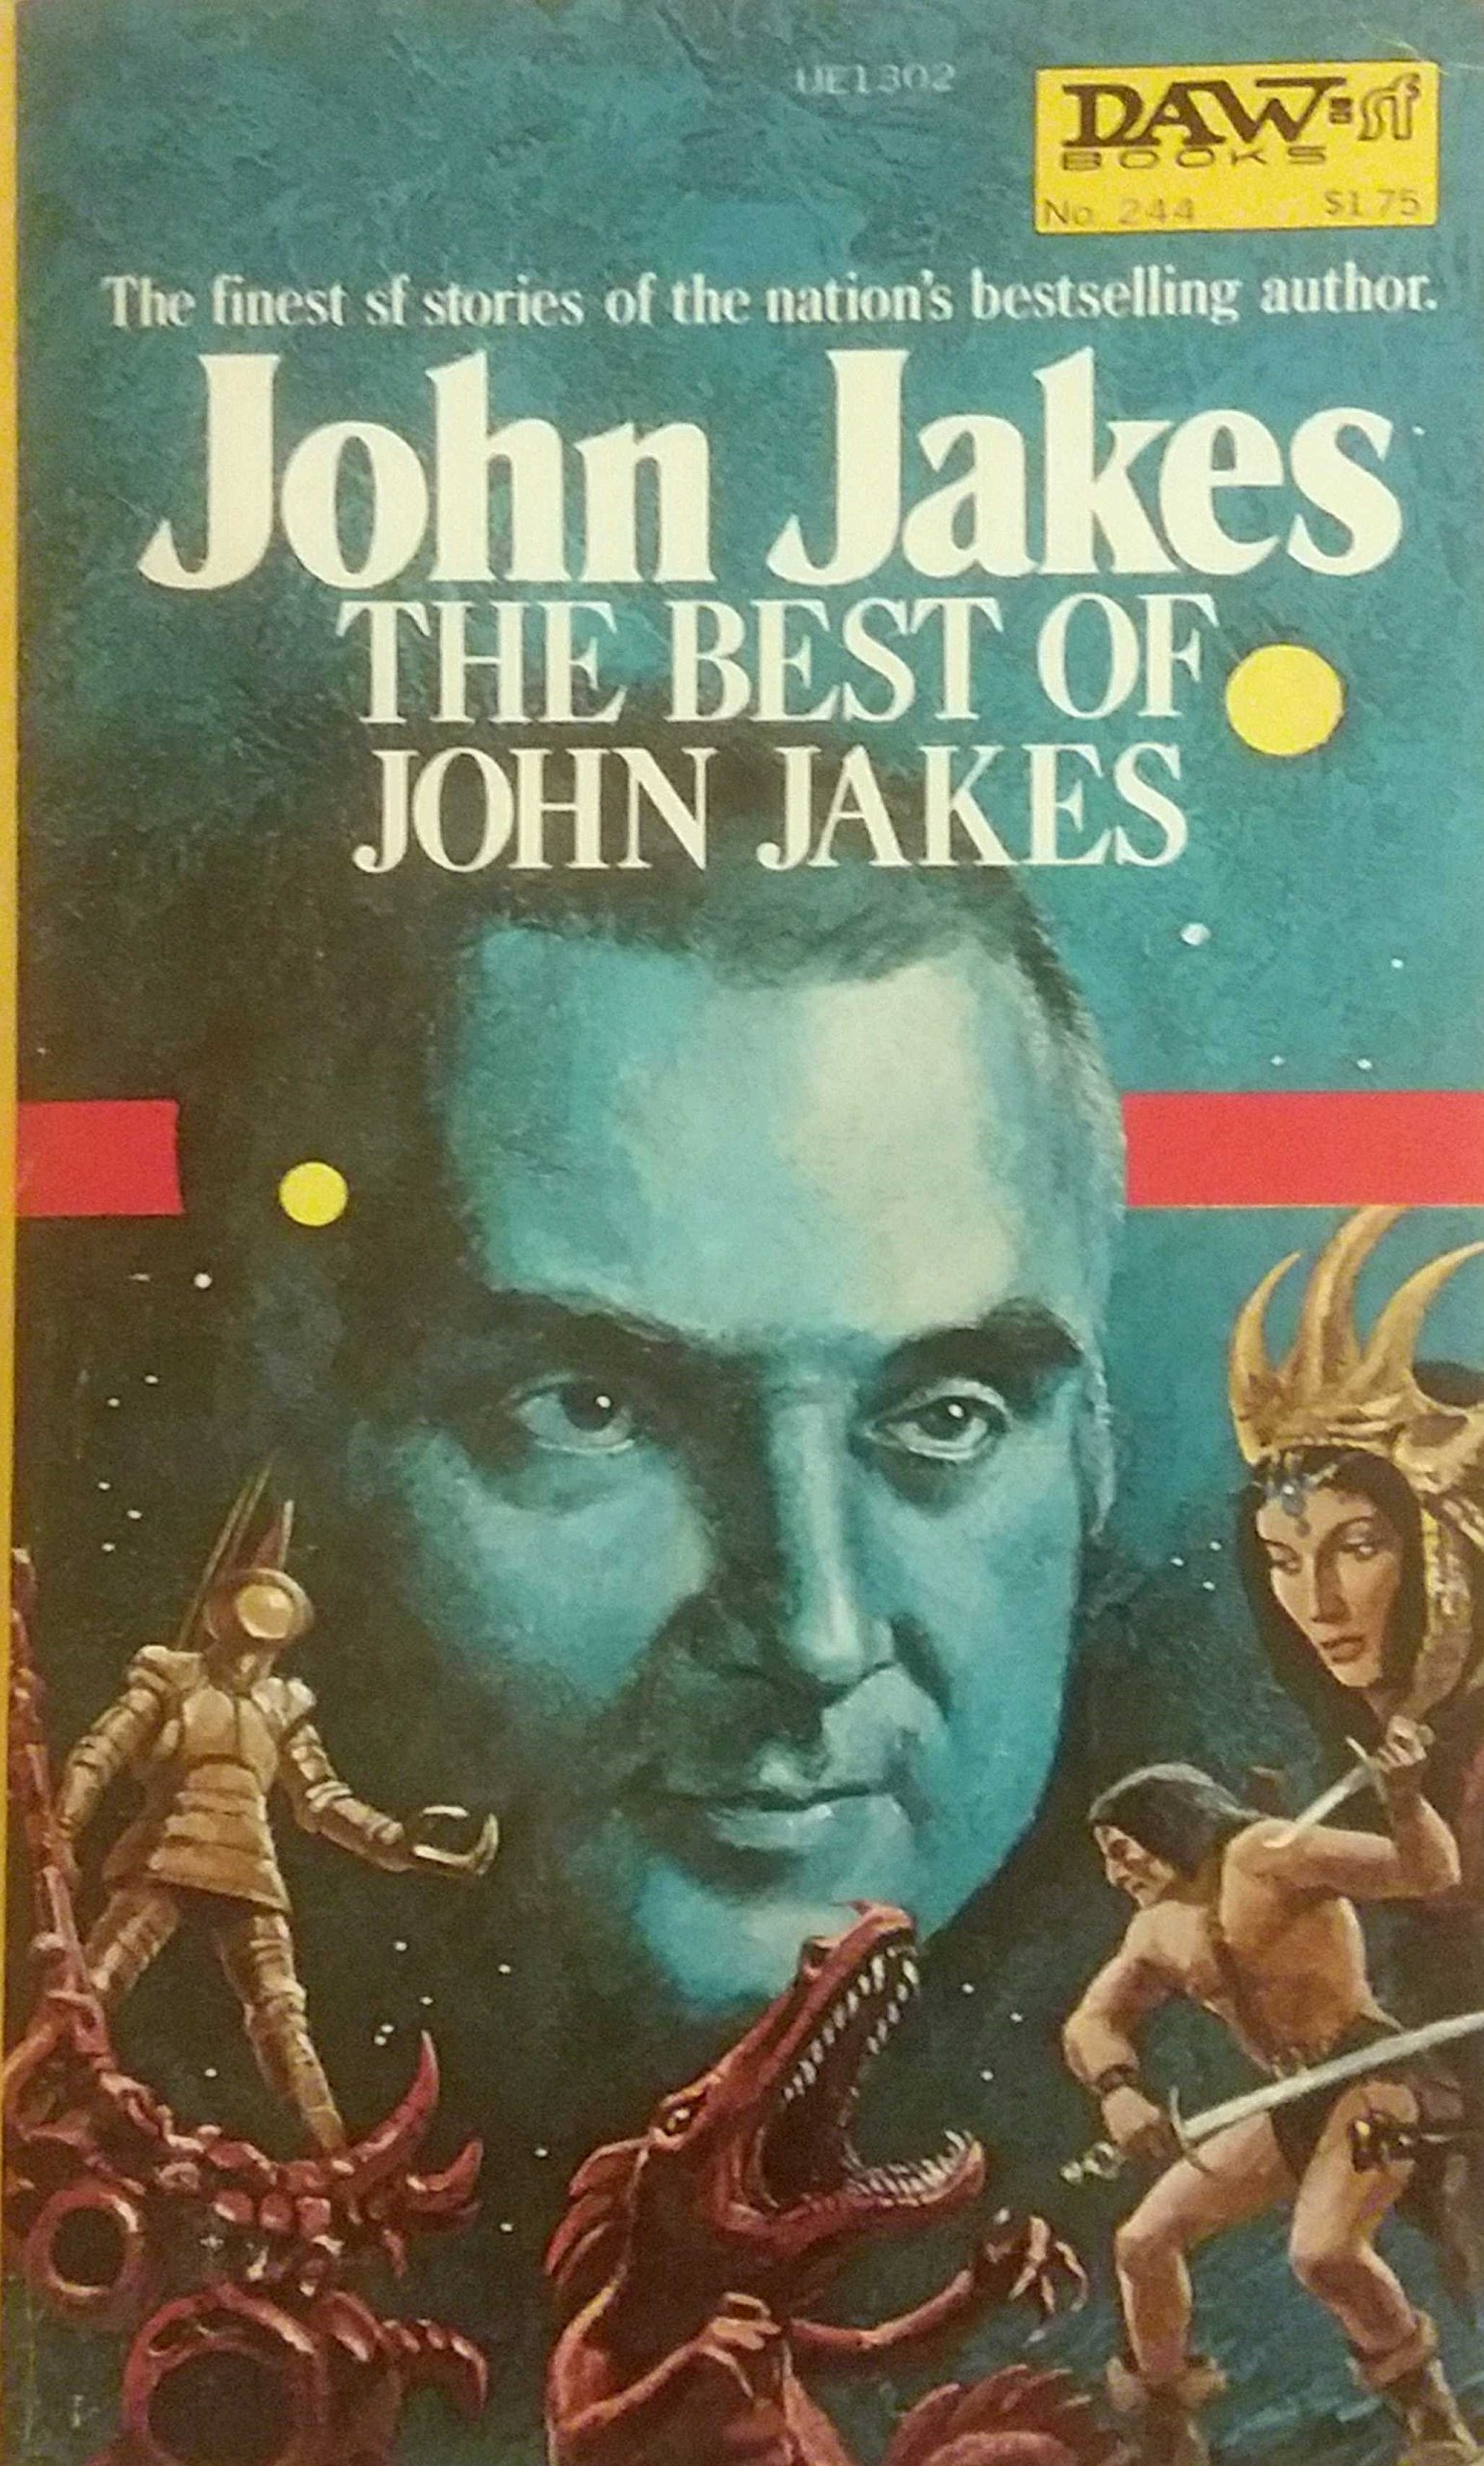 The Best of John Jakes